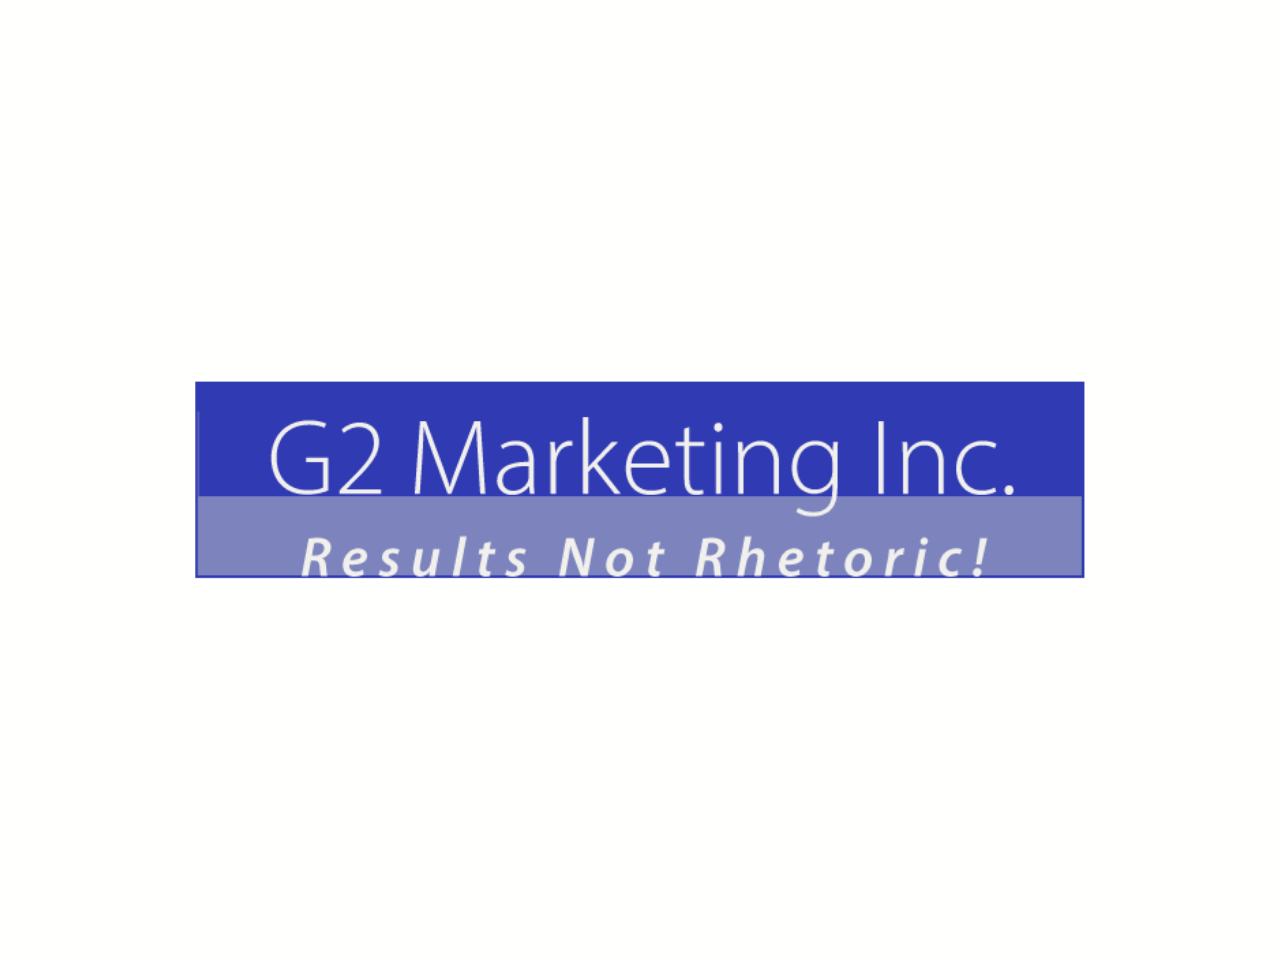 G2 Marketing Inc.